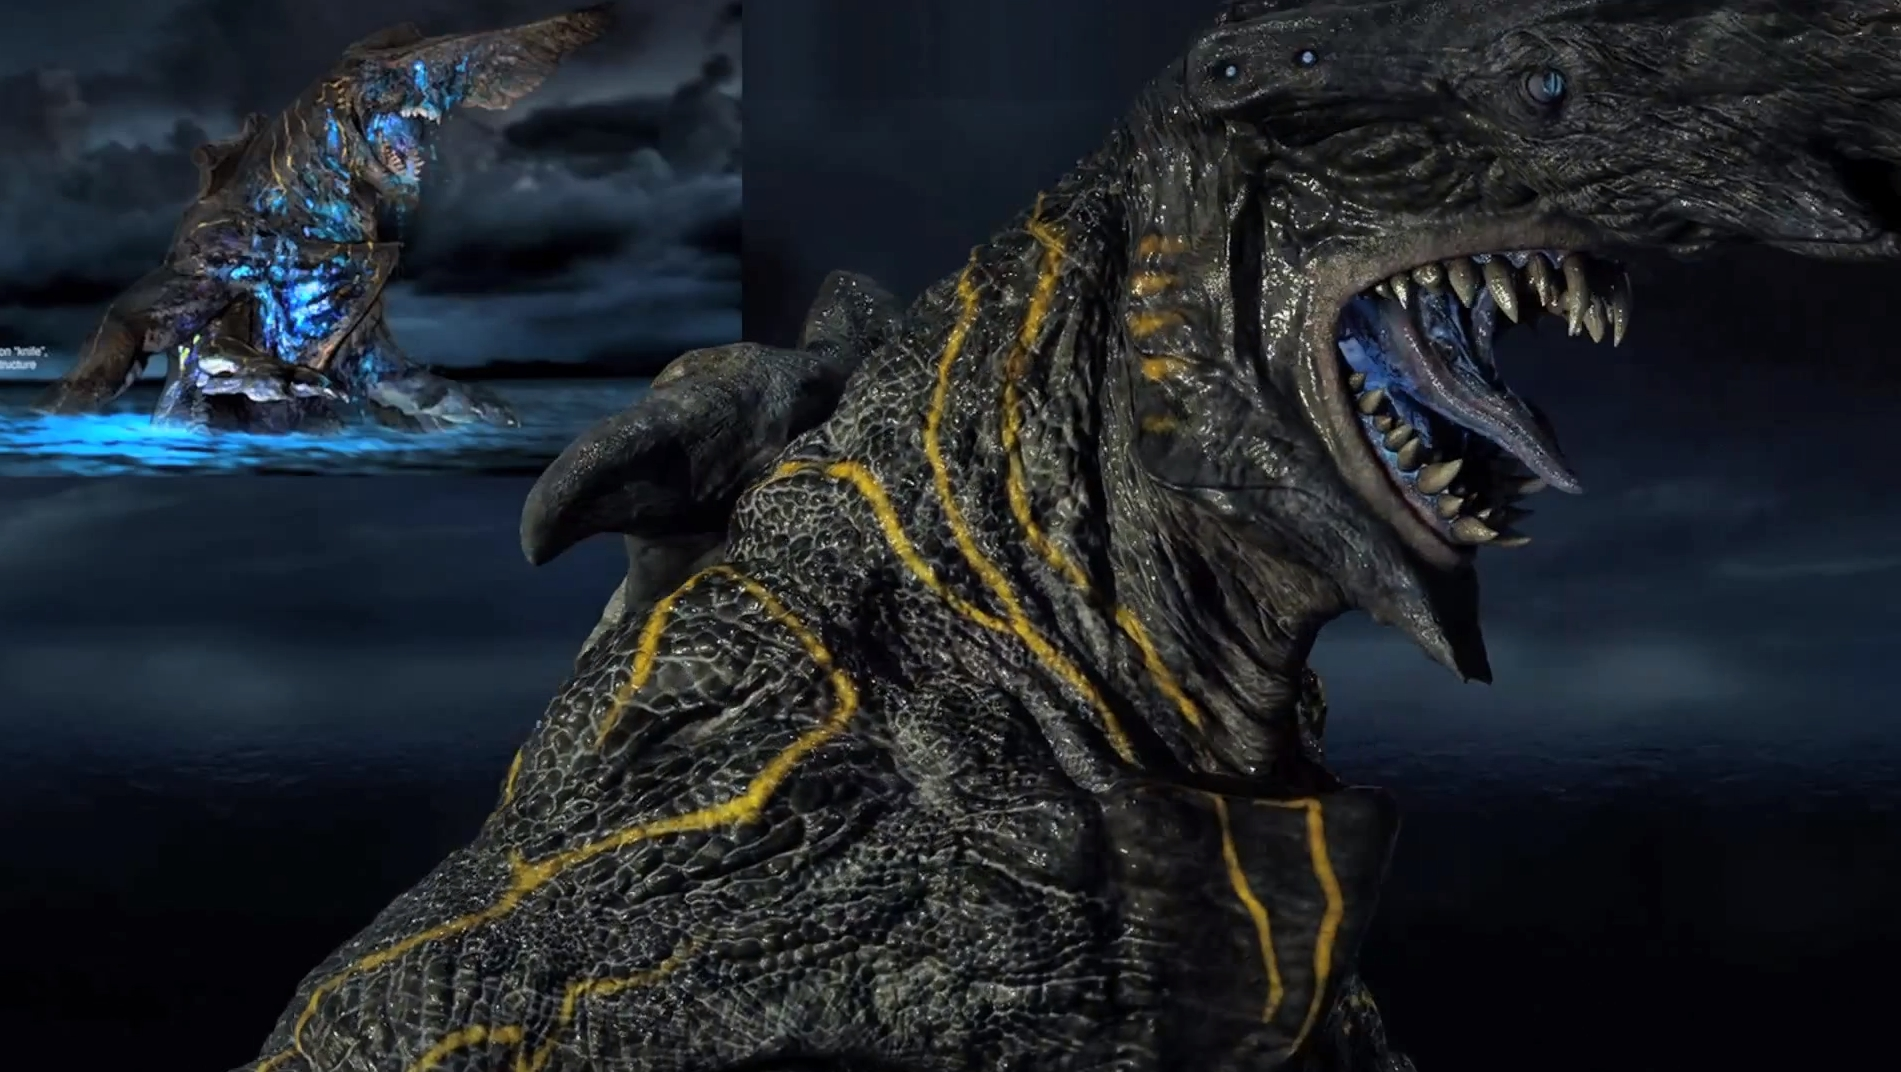 monster_Pacific Rim Digital Art